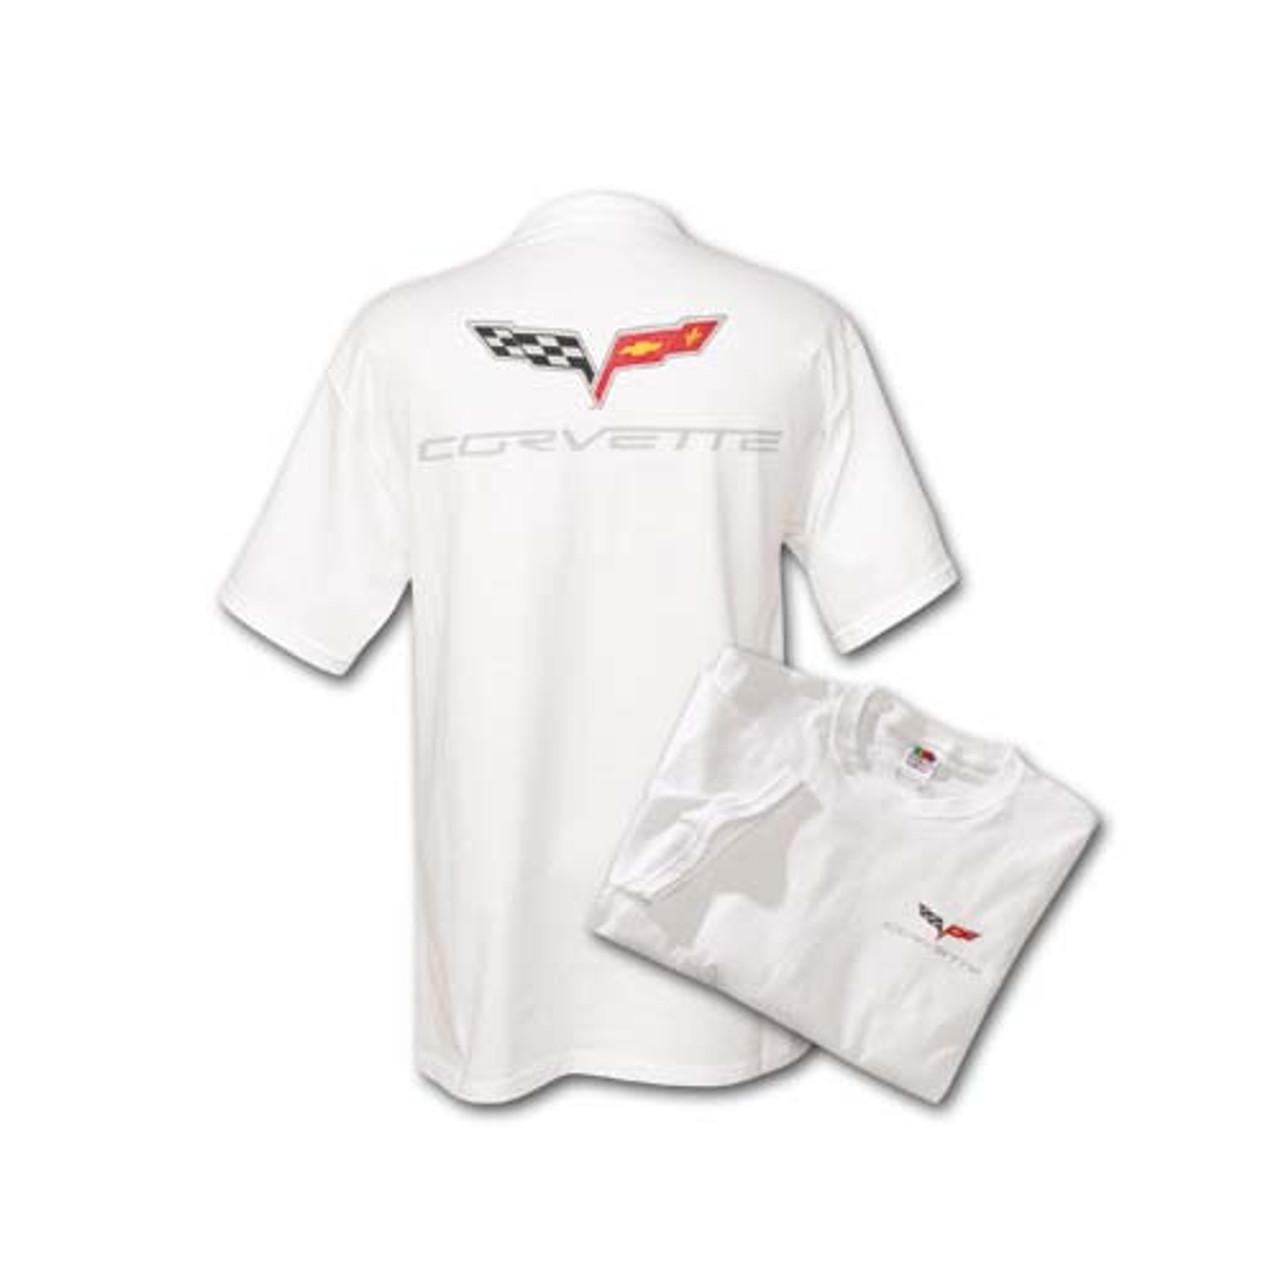 C6 Corvette White T-Shirt (both)